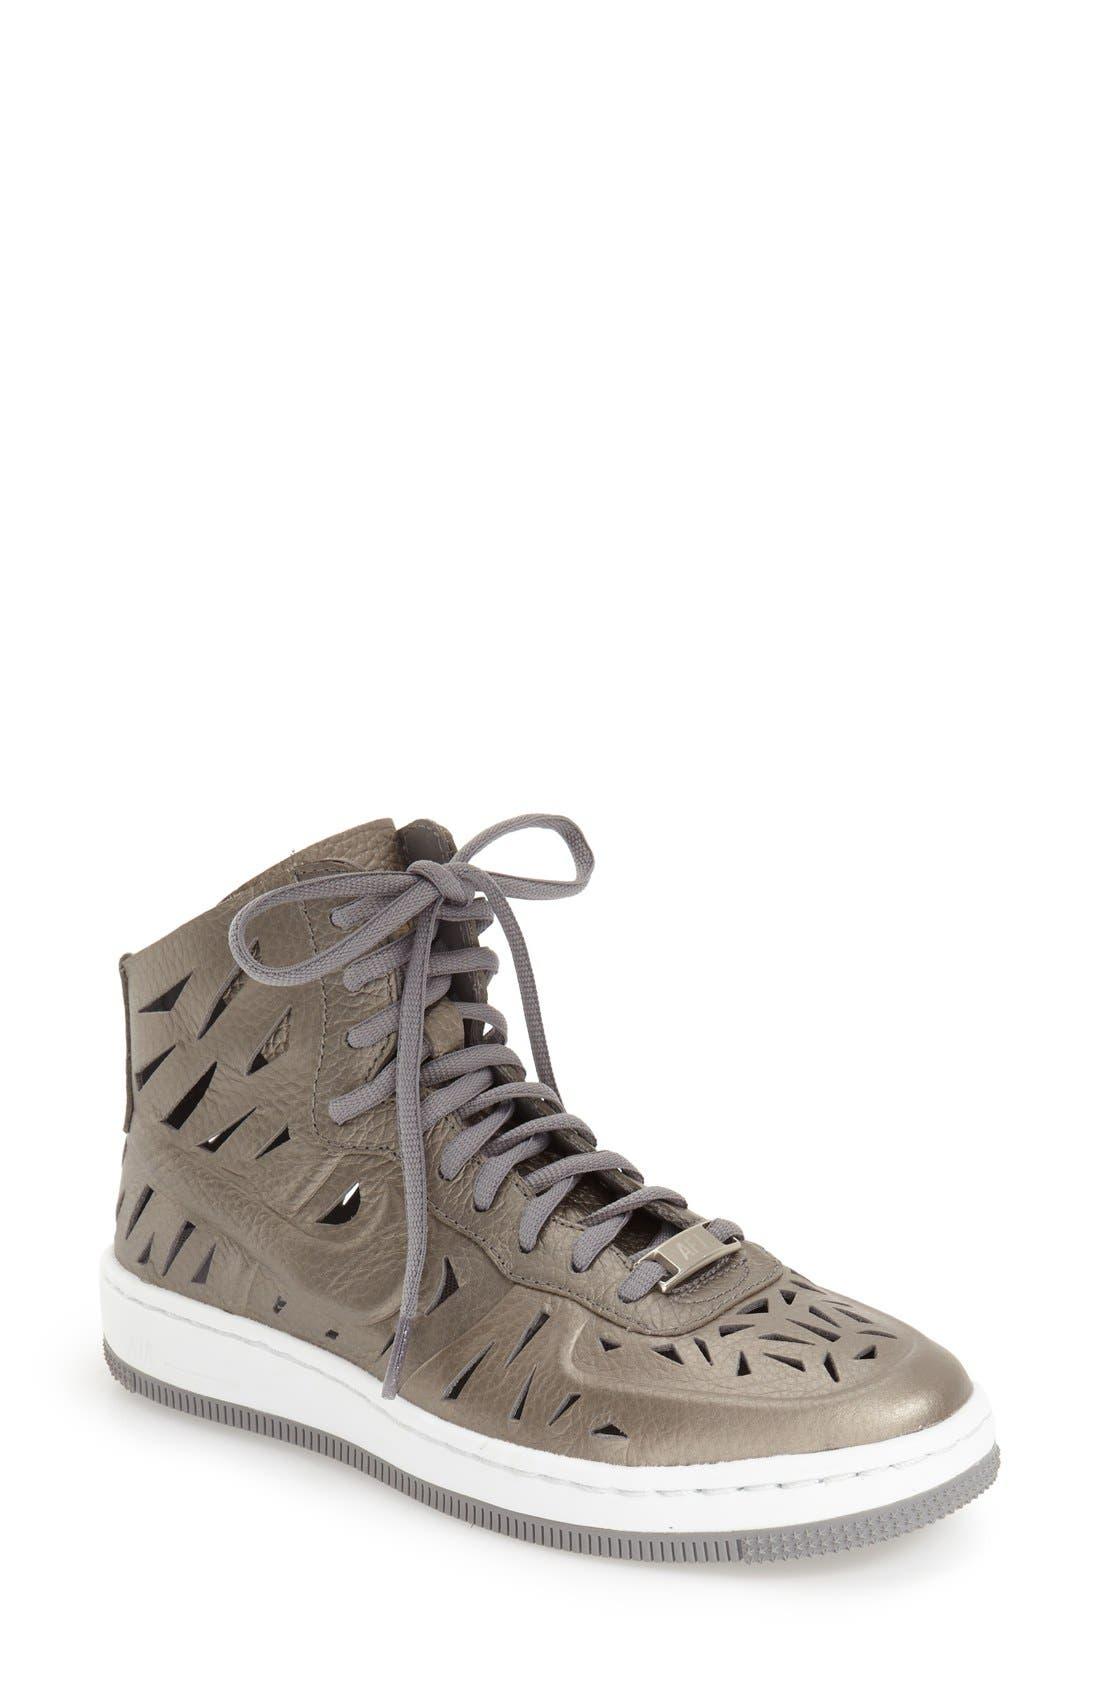 Main Image - Nike 'Air Force 1 - Ultra Force Joli' High Top Sneaker (Women)